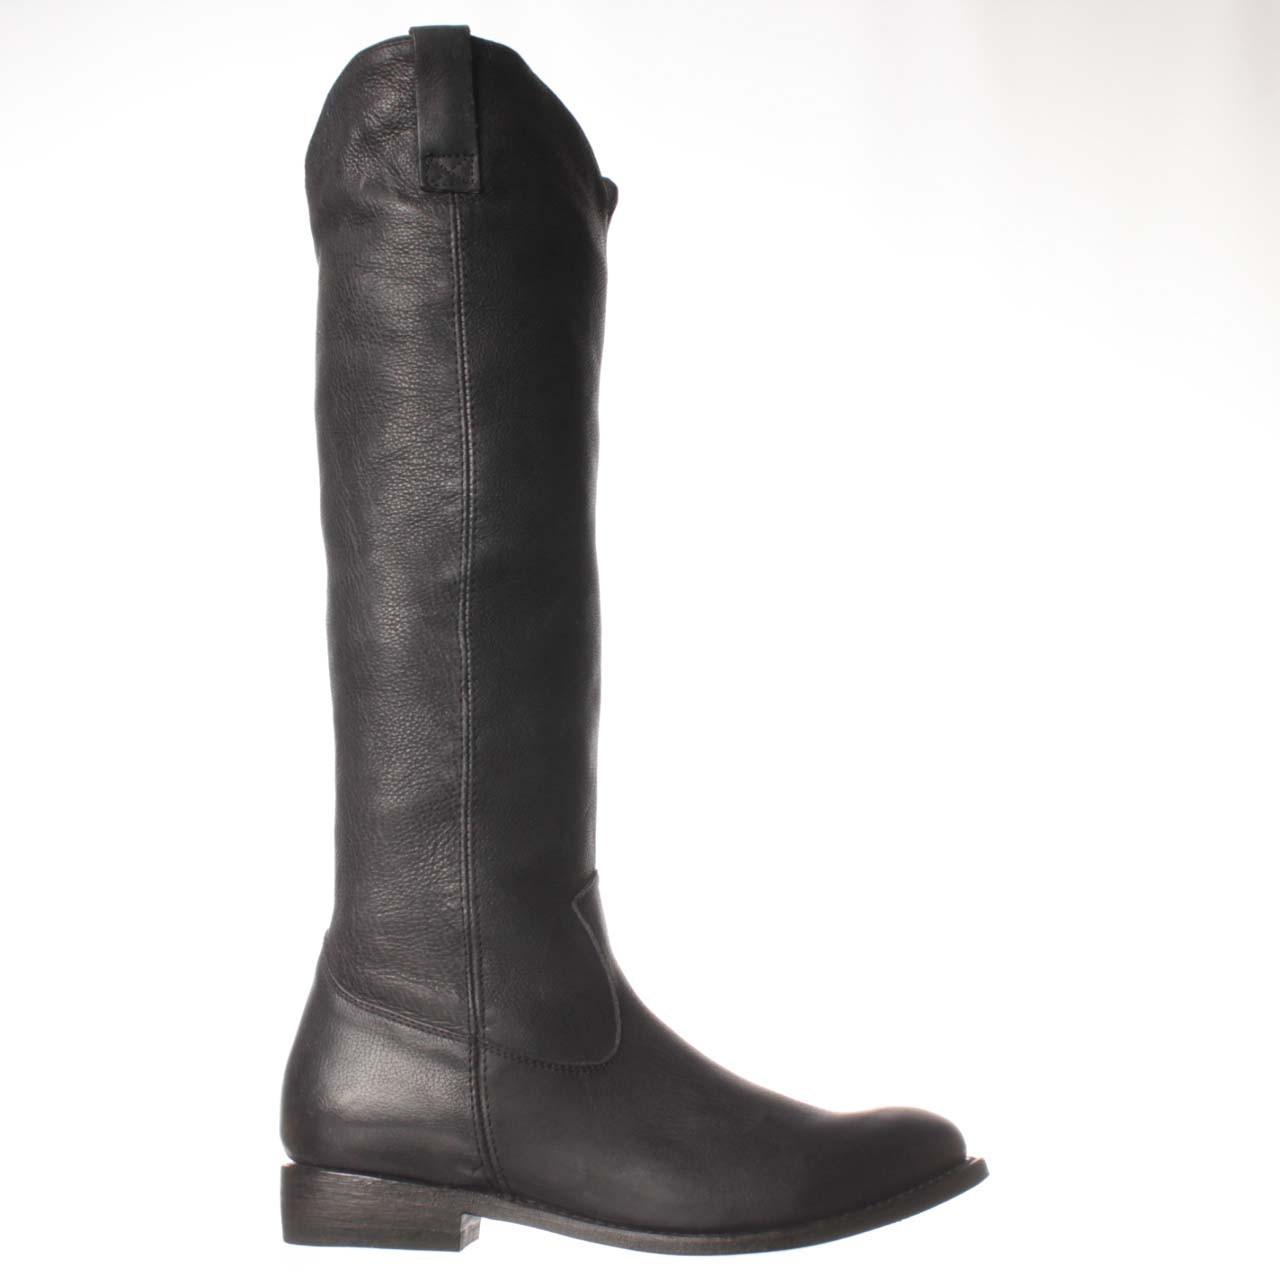 20af7bbebb9 Dolce Vita Dv By Lujan Knee-high Boot in Black - Lyst